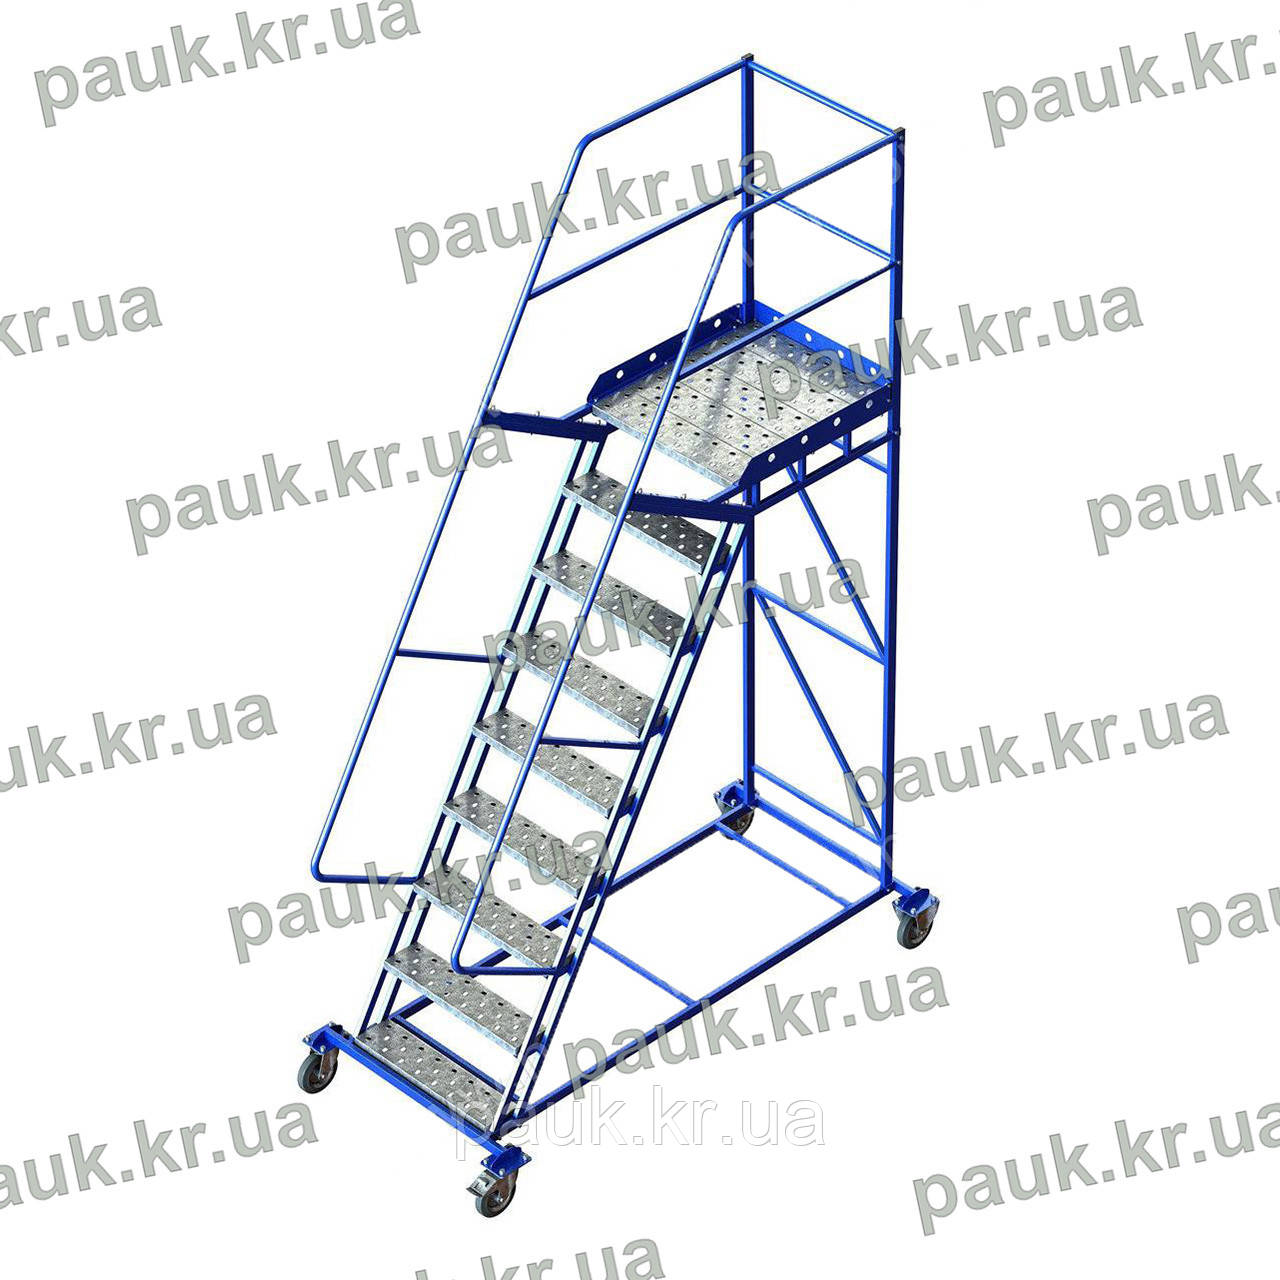 Платформова драбина Н2250 мм, сталева пересувна